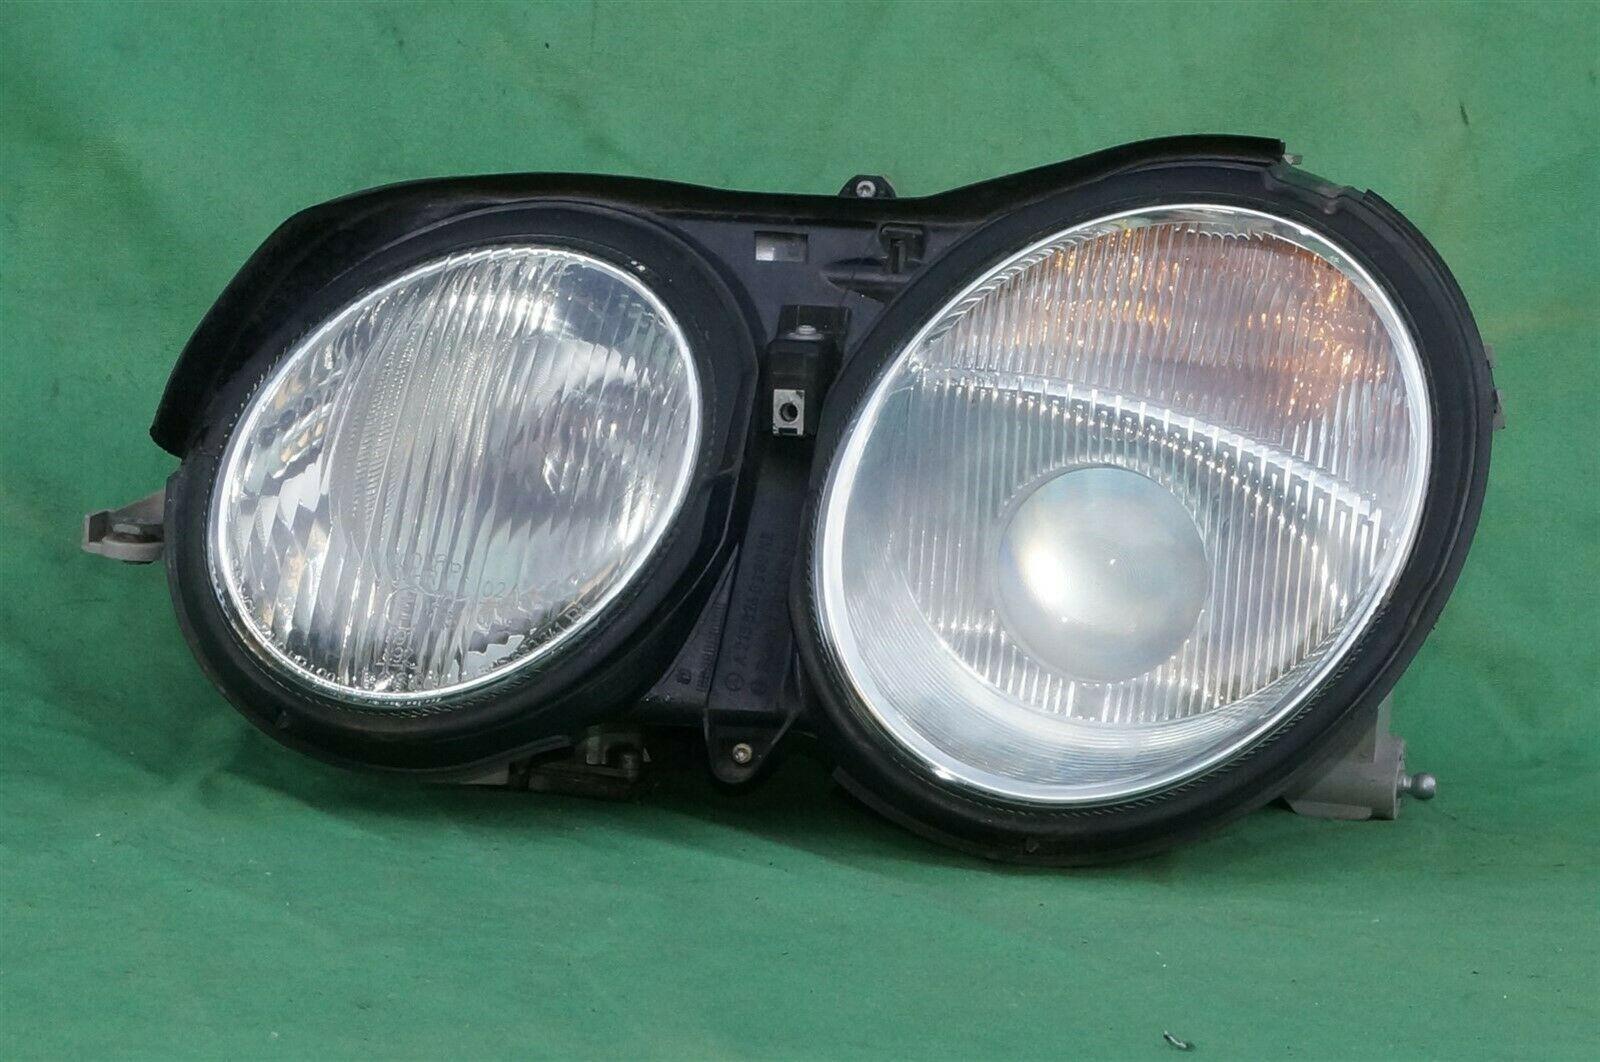 01-02 Mercedes W215 CL500 CL600 CL55 AMG Xenon HID Headlight Driver LEFT LH